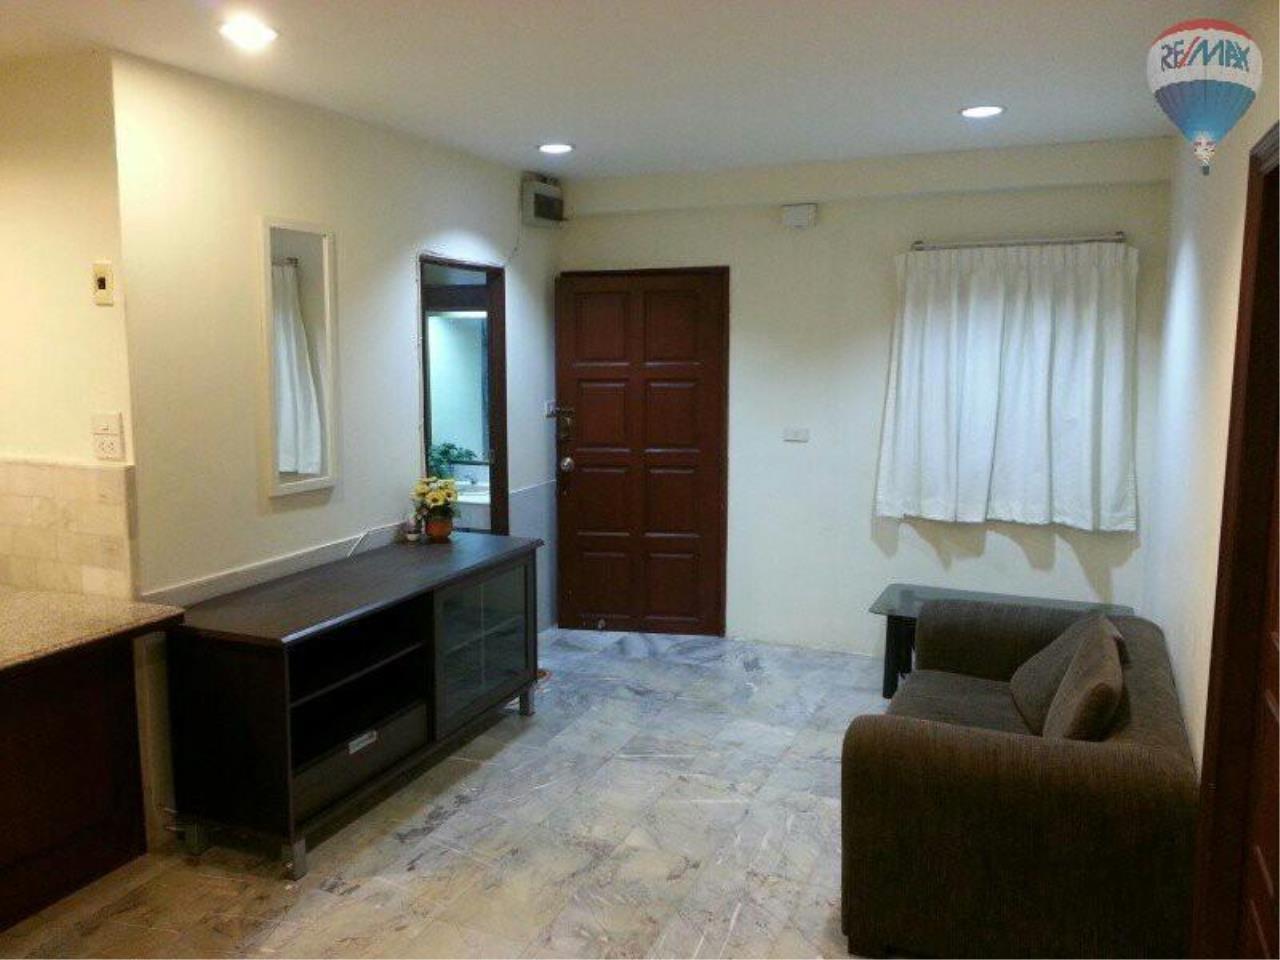 RE/MAX Properties Agency's 1 Bedroom 56 Sq.m for SALE at Saranjai Mansion,Sukhumvit Soi 4 (Nana) 2